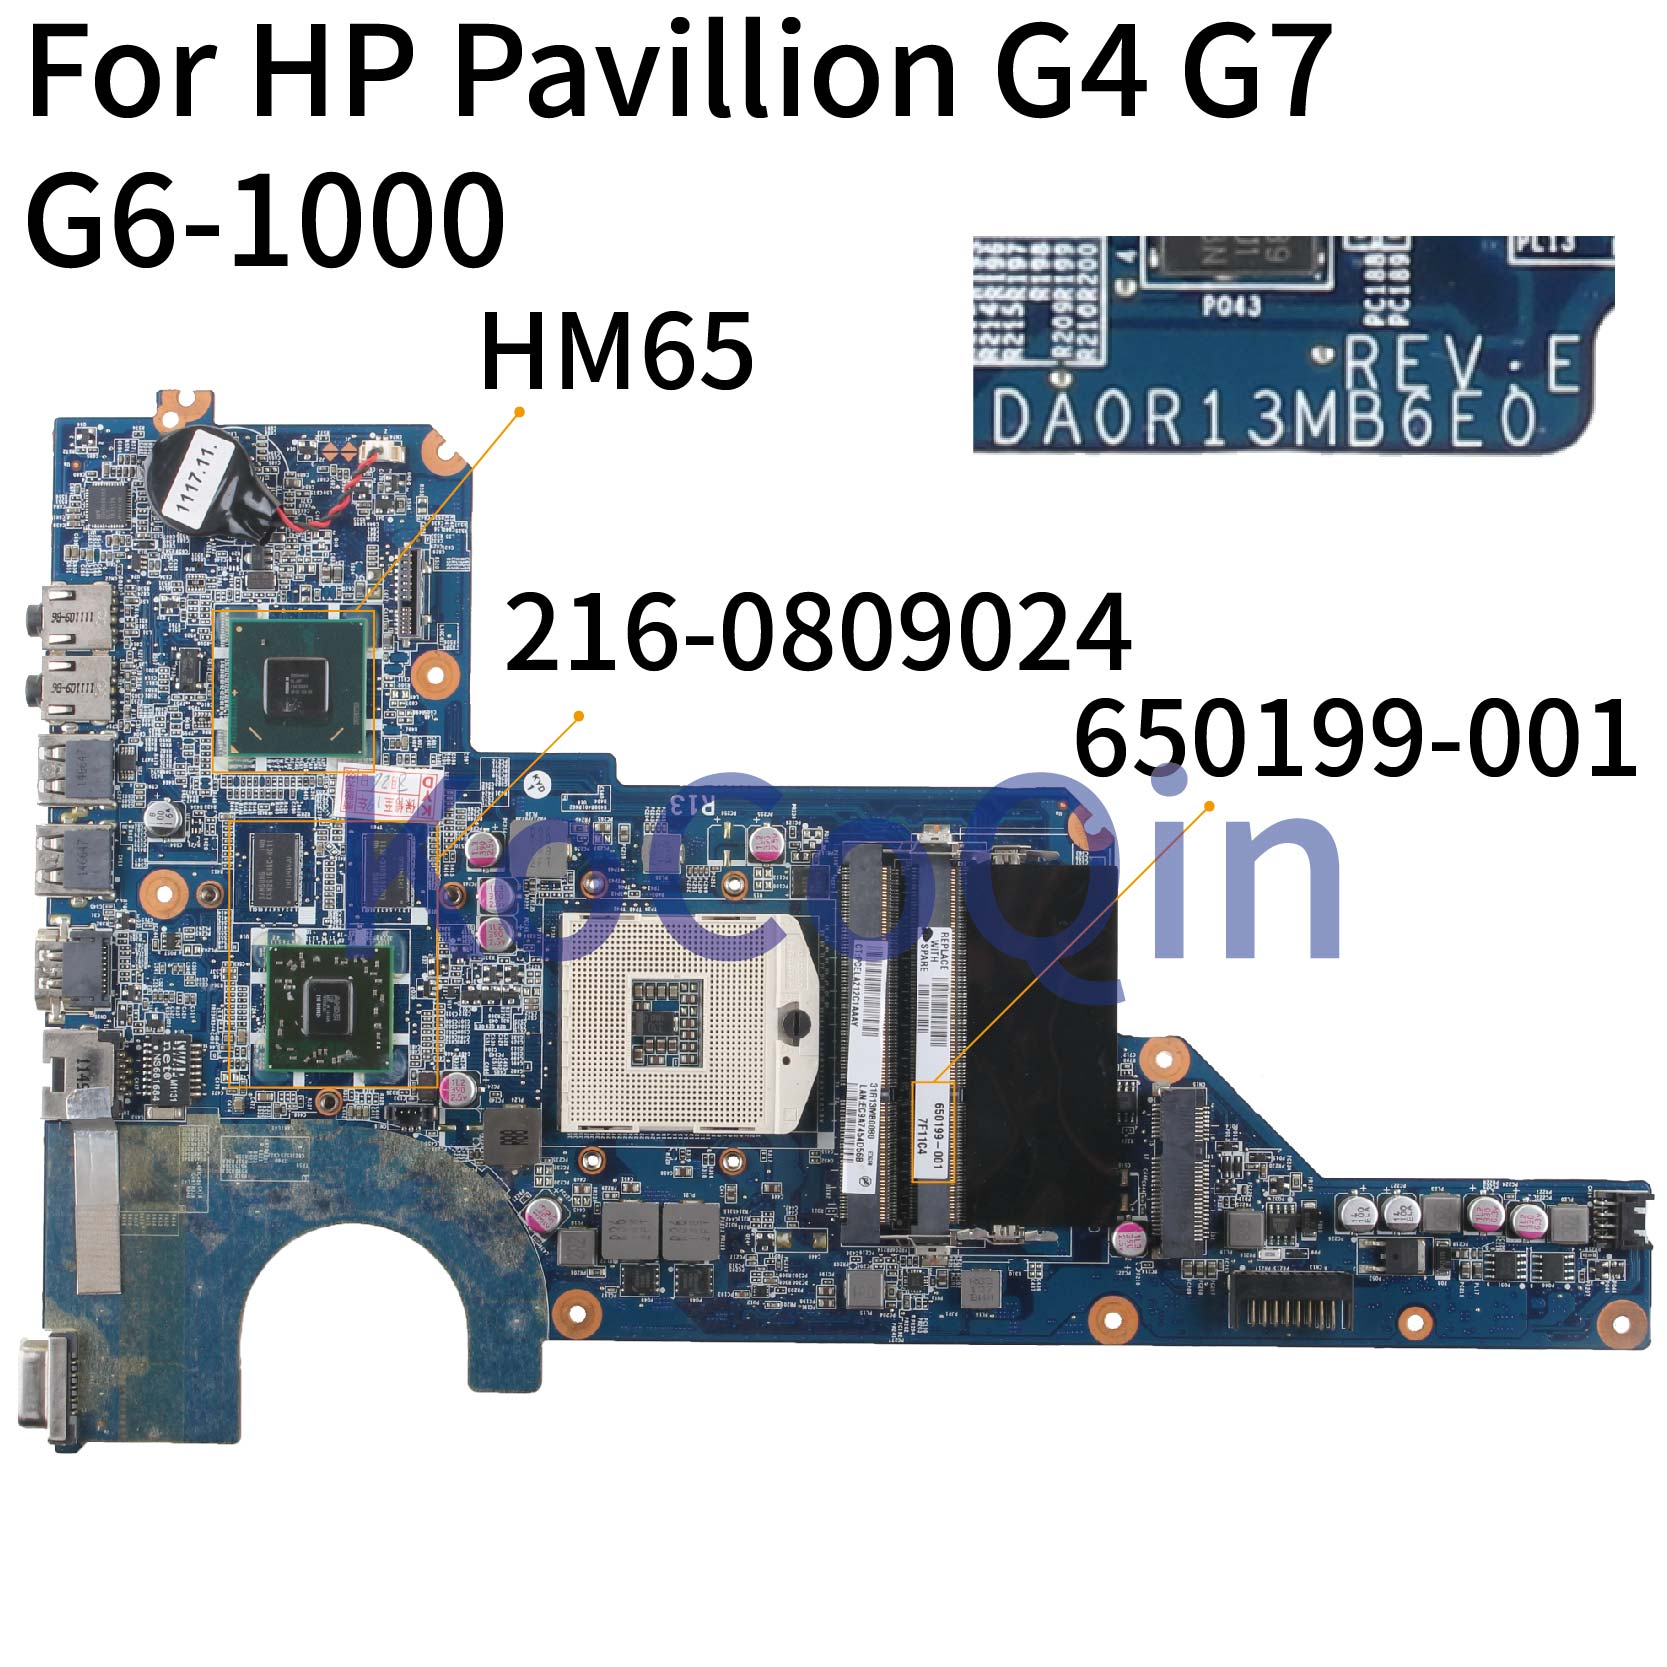 KoCoQin Laptop Motherboard For HP Pavillion G4 G4-1000 G6 HD6470 Mainboard 650199-001 636375-001 DA0R13MB6E1 216-0809024 HM65